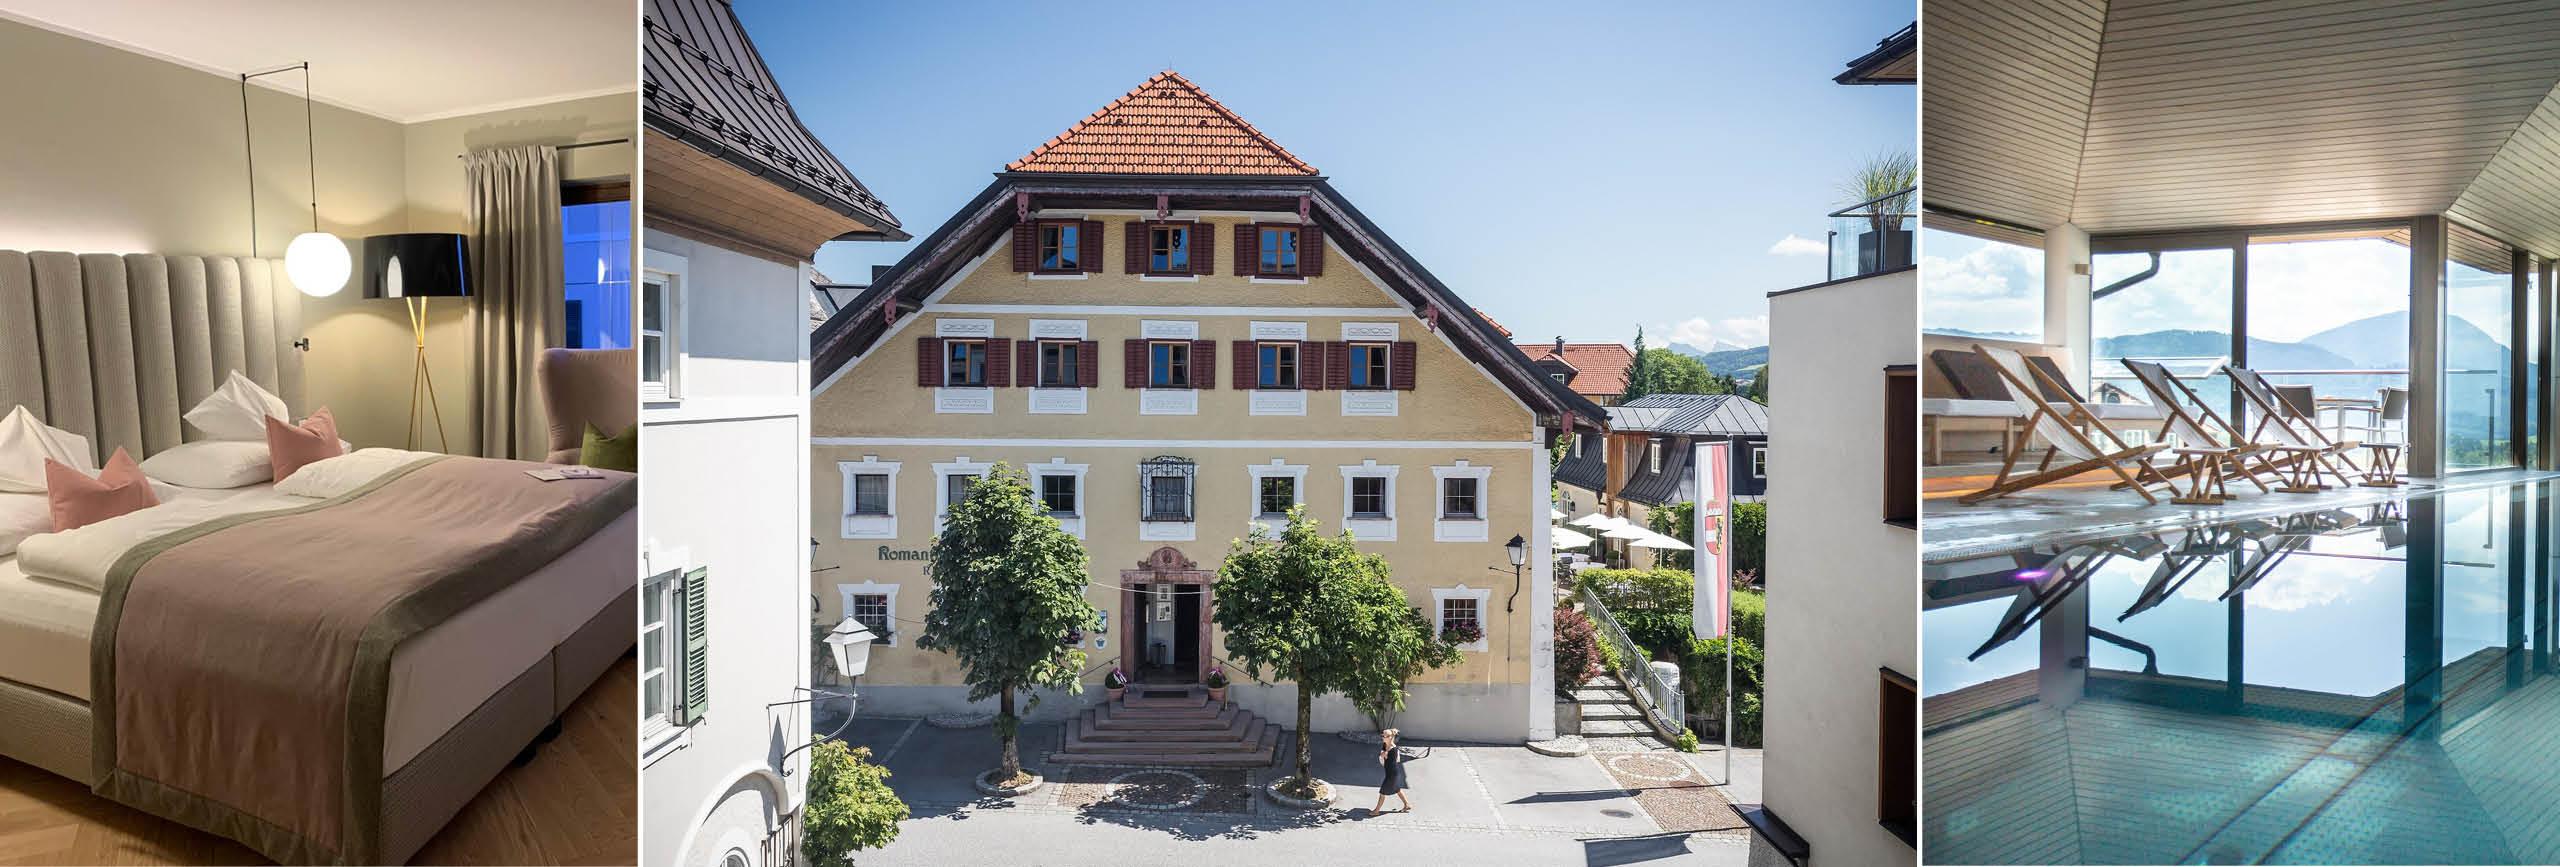 Romantik Spa Hotel Elixhauser Wirt****s